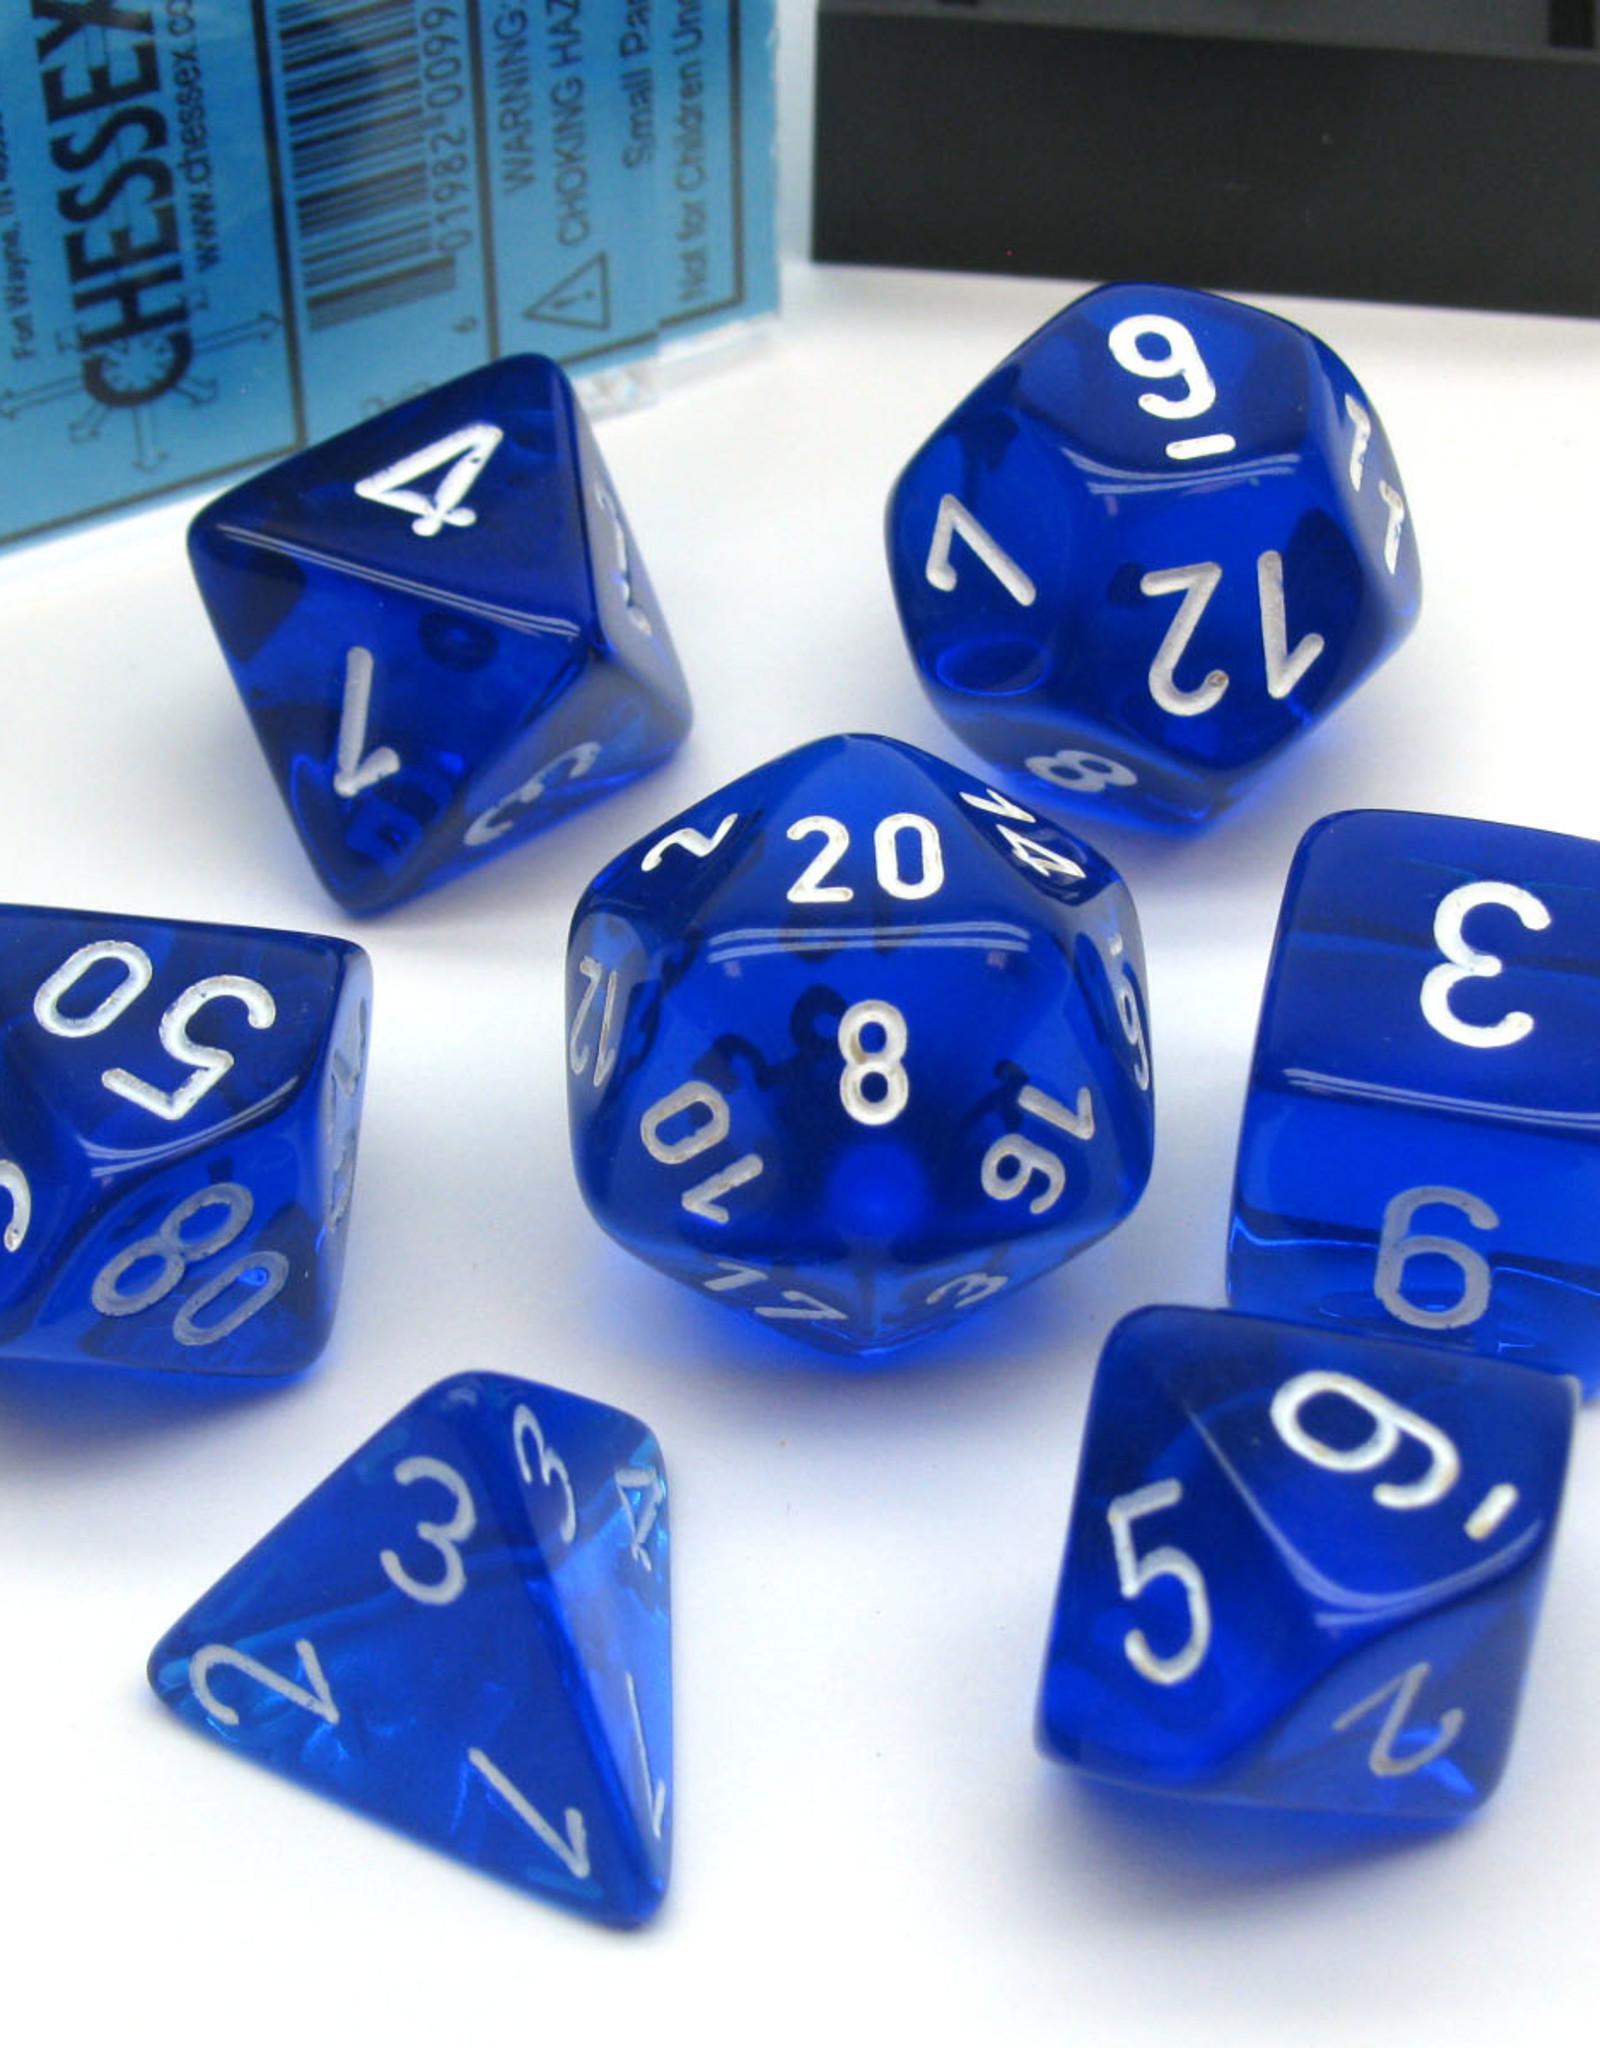 Chessex Dice Block 7ct. - Trans Blue/White